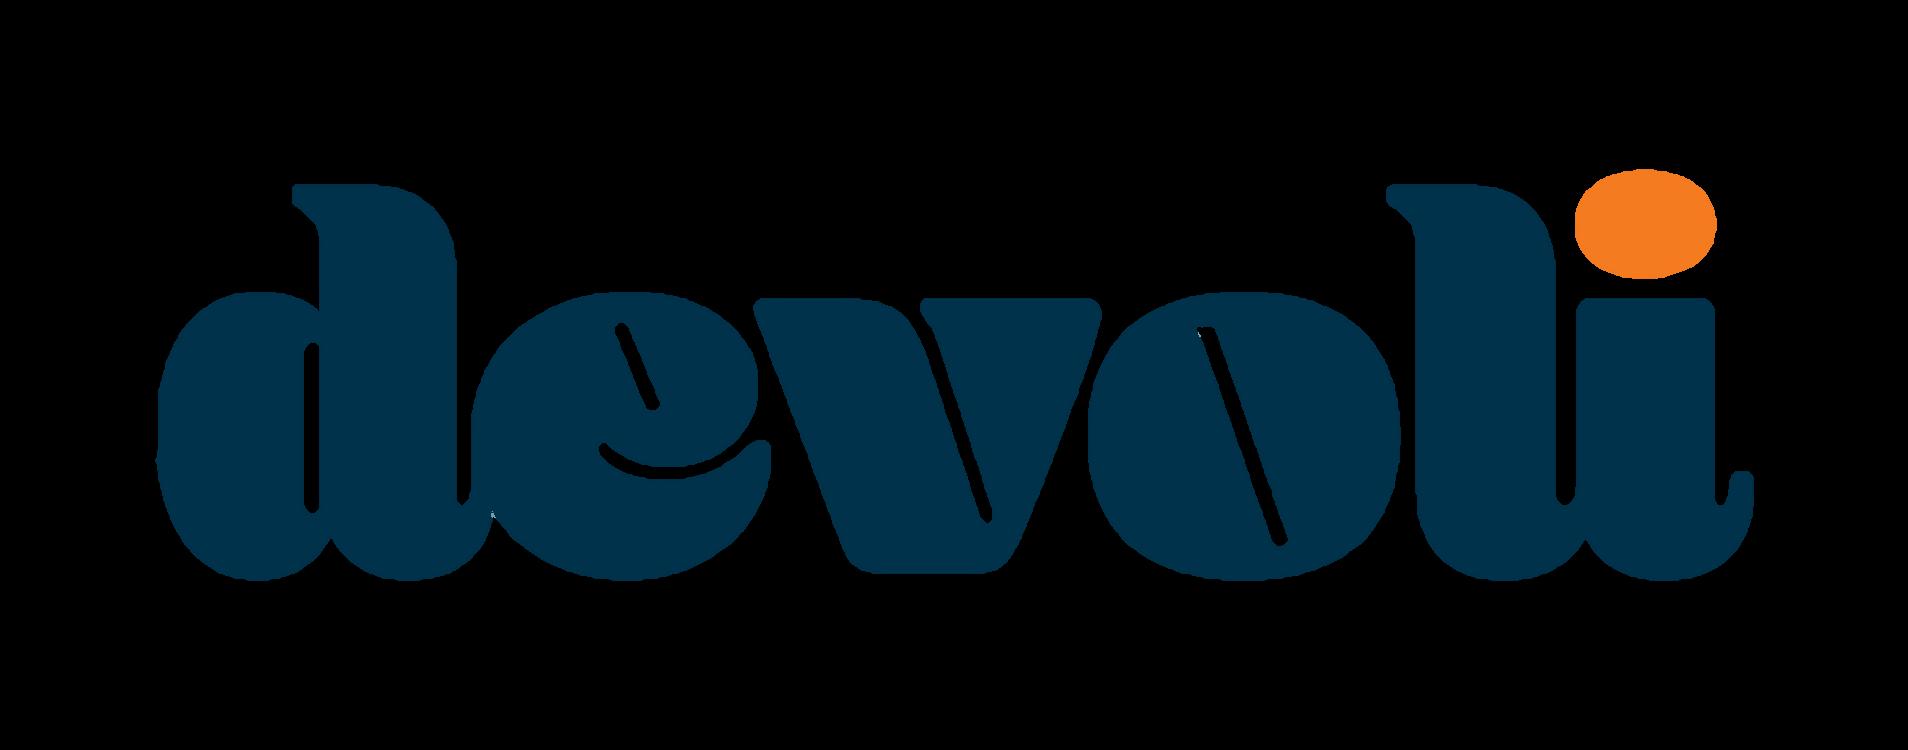 Devoli:Revolutionising your Service Provider Experience